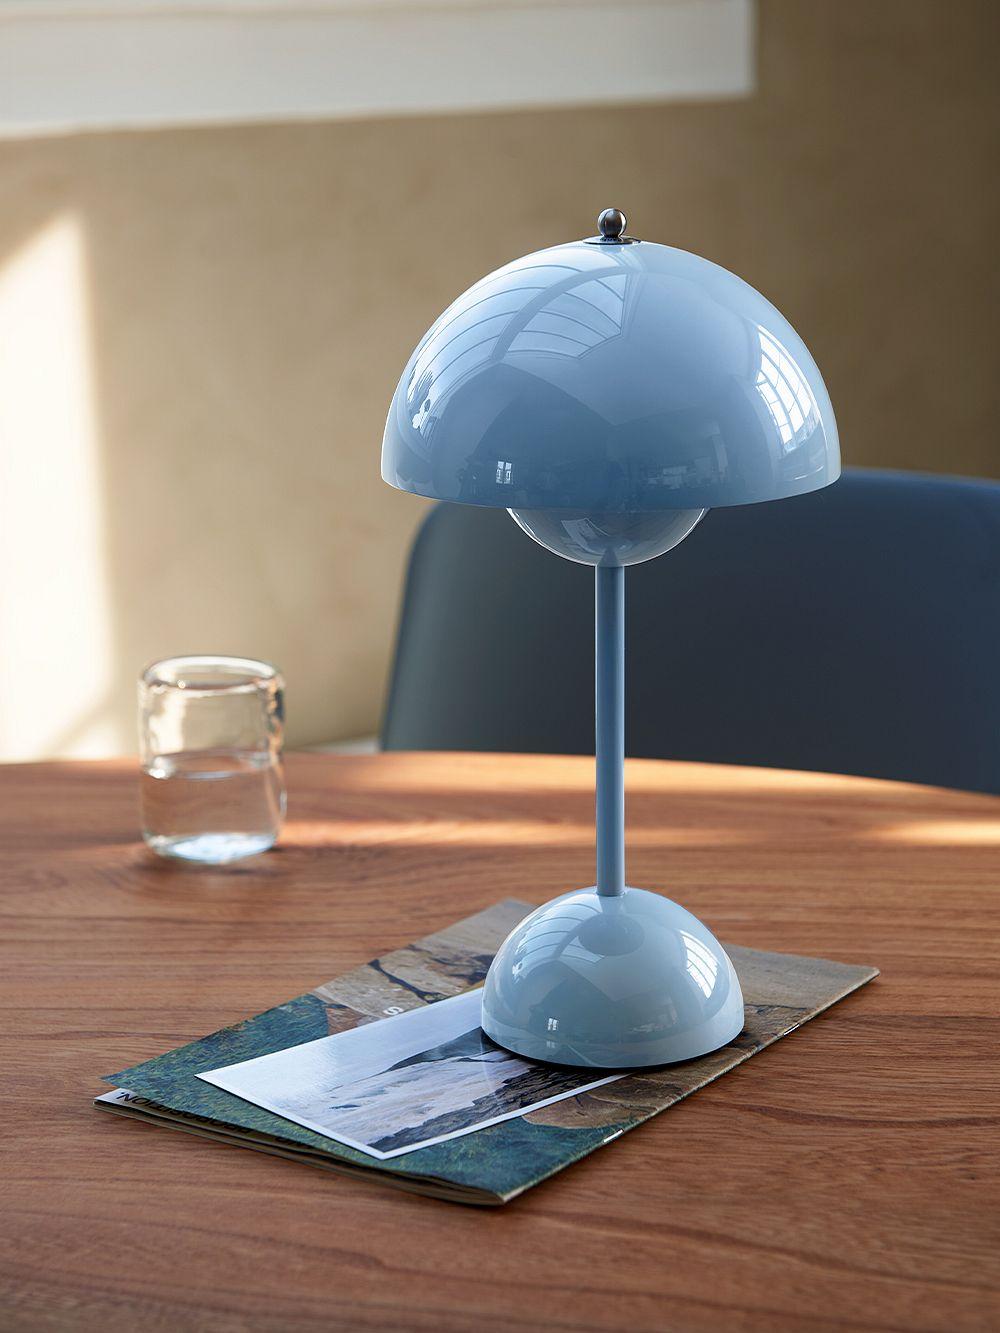 &Tradition Flowerpot VP9 portable table lamp, light blue